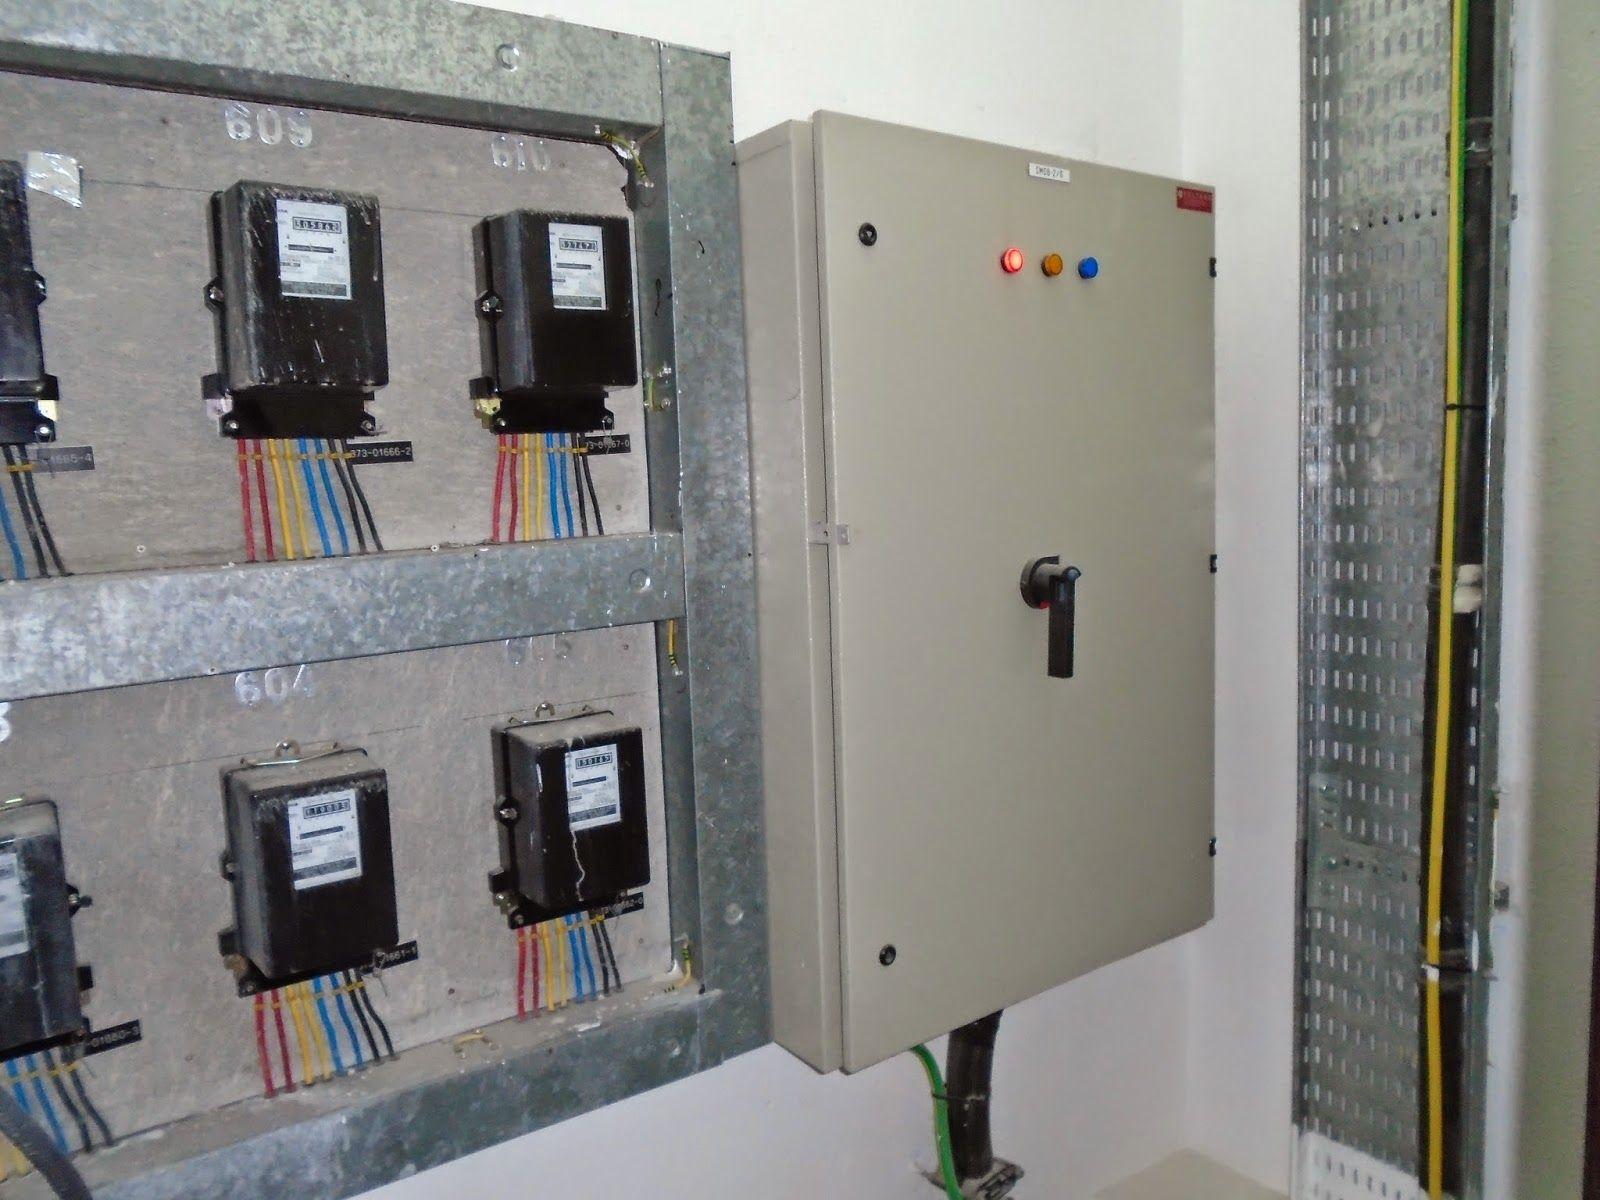 electrical wiring in bangladesh smdb and meter basic basic home electrical wiring diagram [ 1600 x 1200 Pixel ]